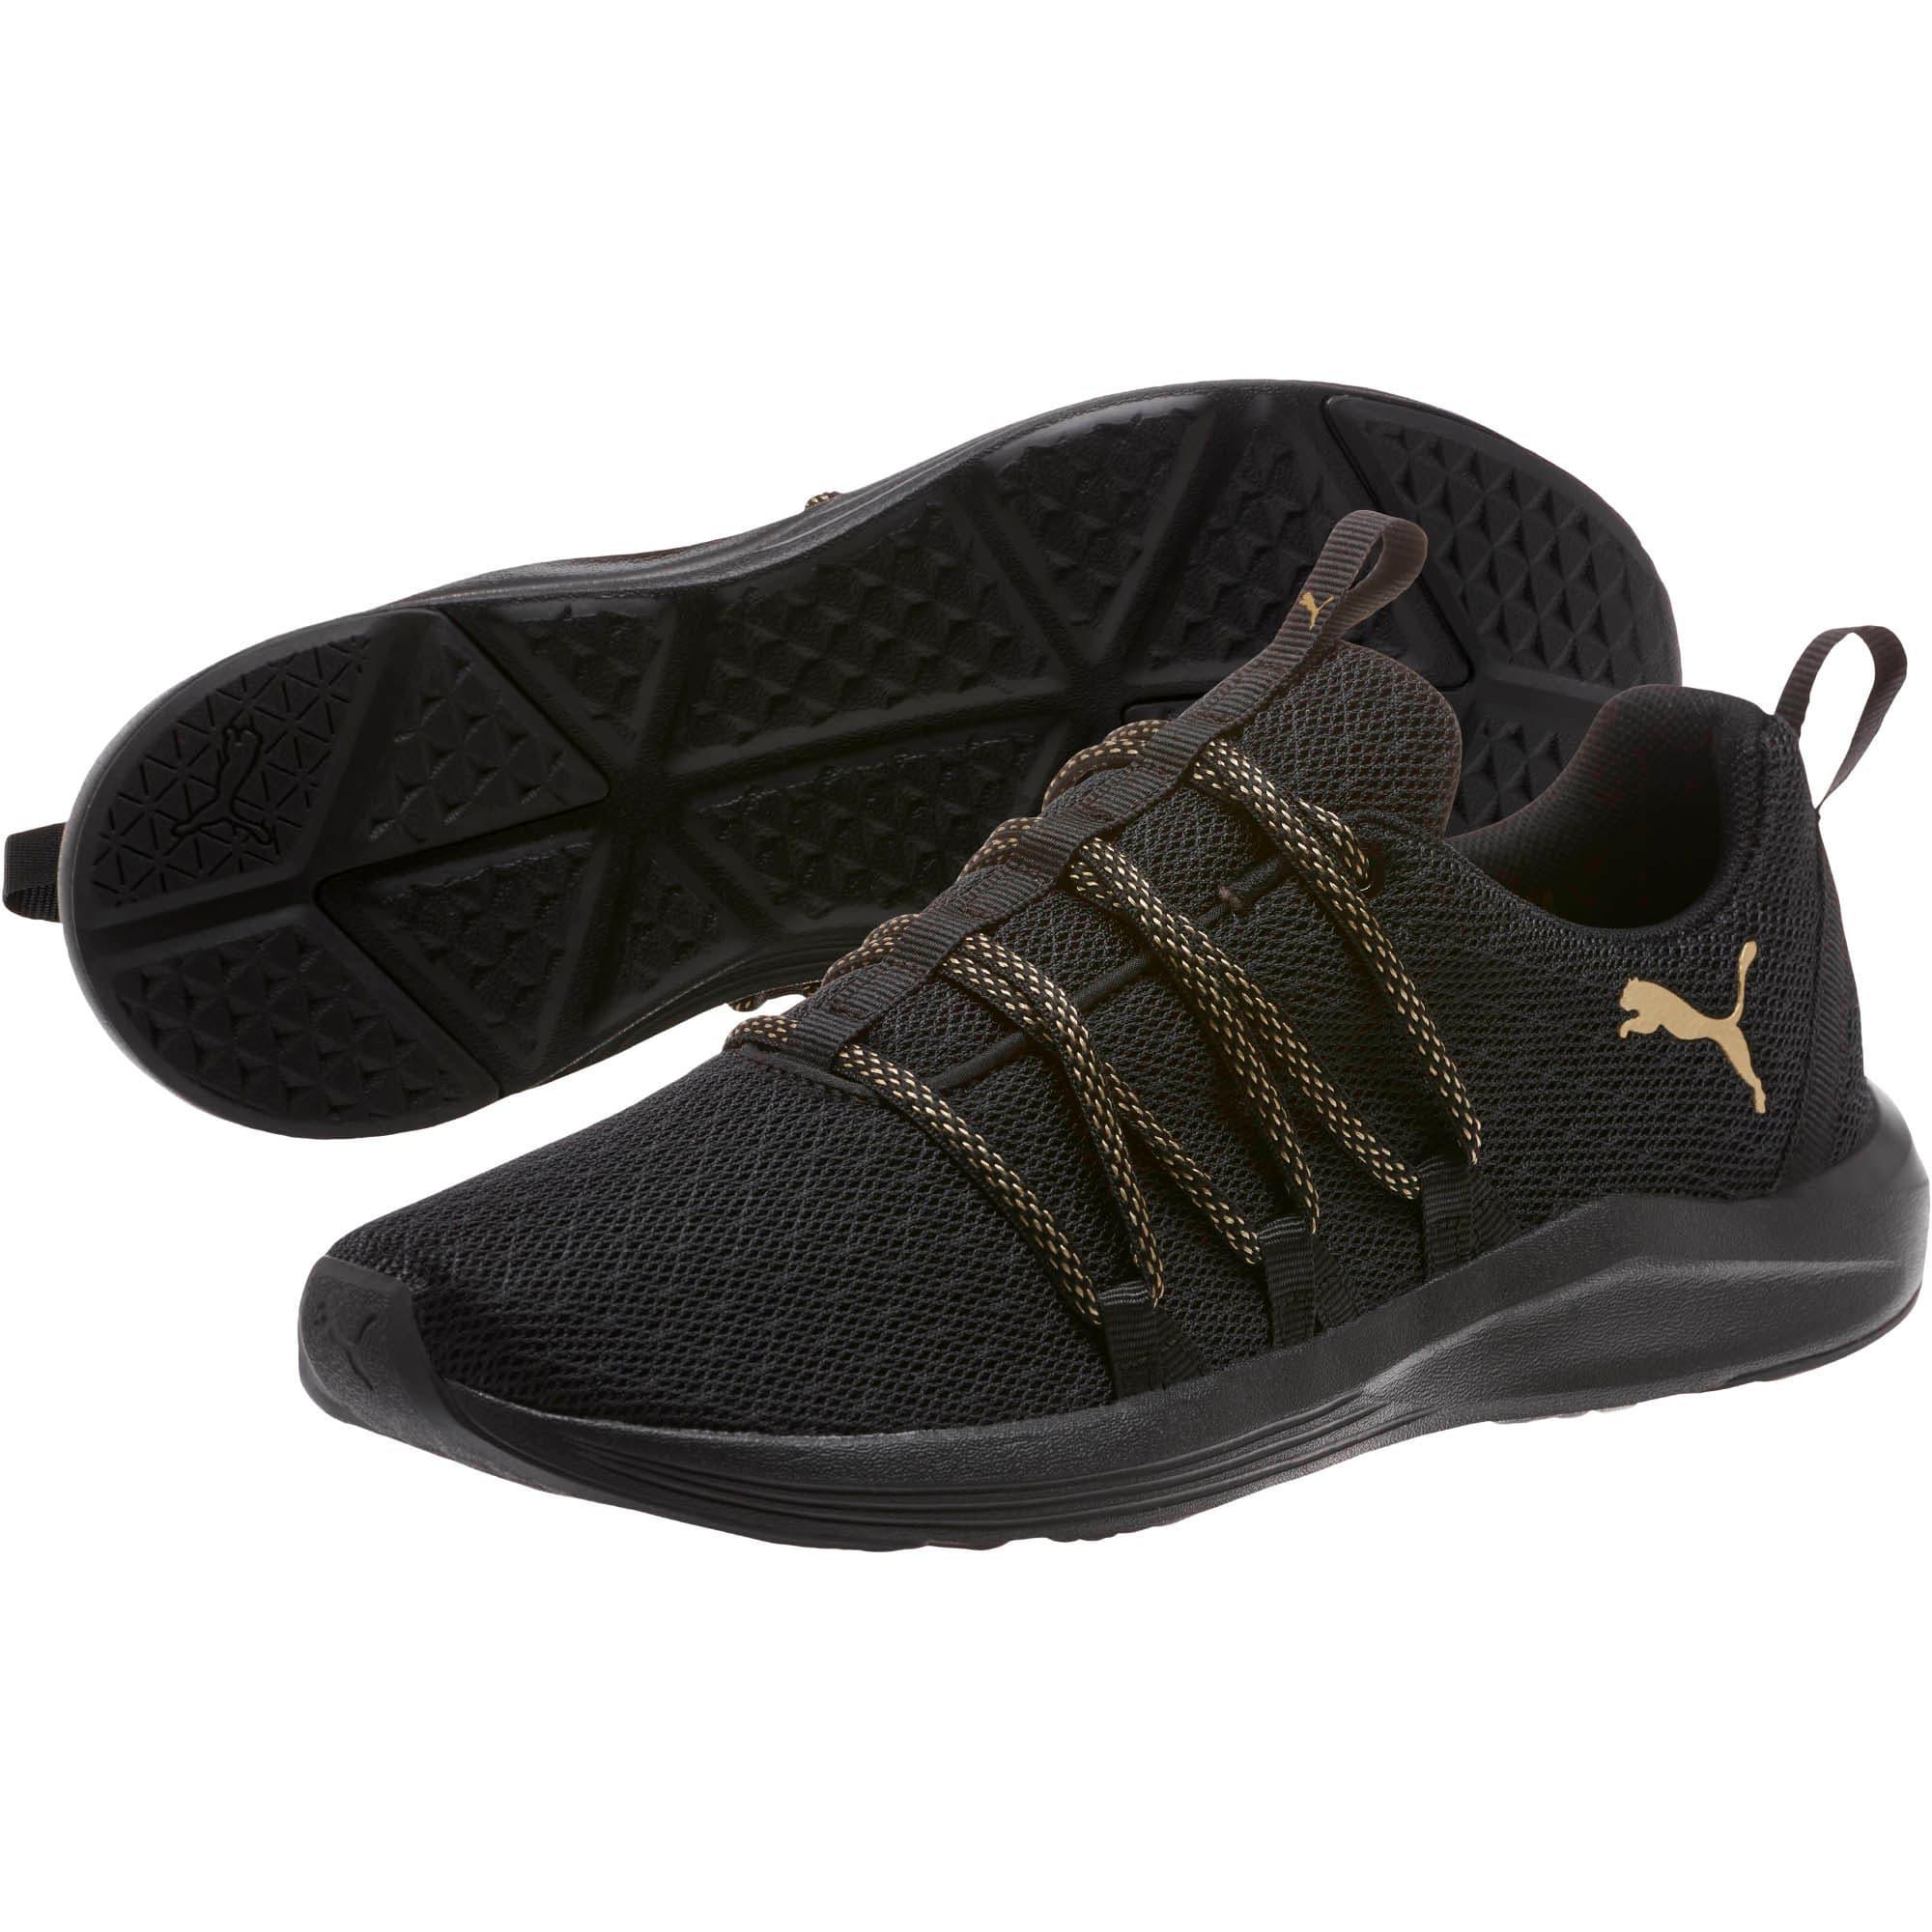 Thumbnail 2 of Prowl Alt Knit Mesh Women's Running Shoes, Puma Black-Metallic Gold, medium